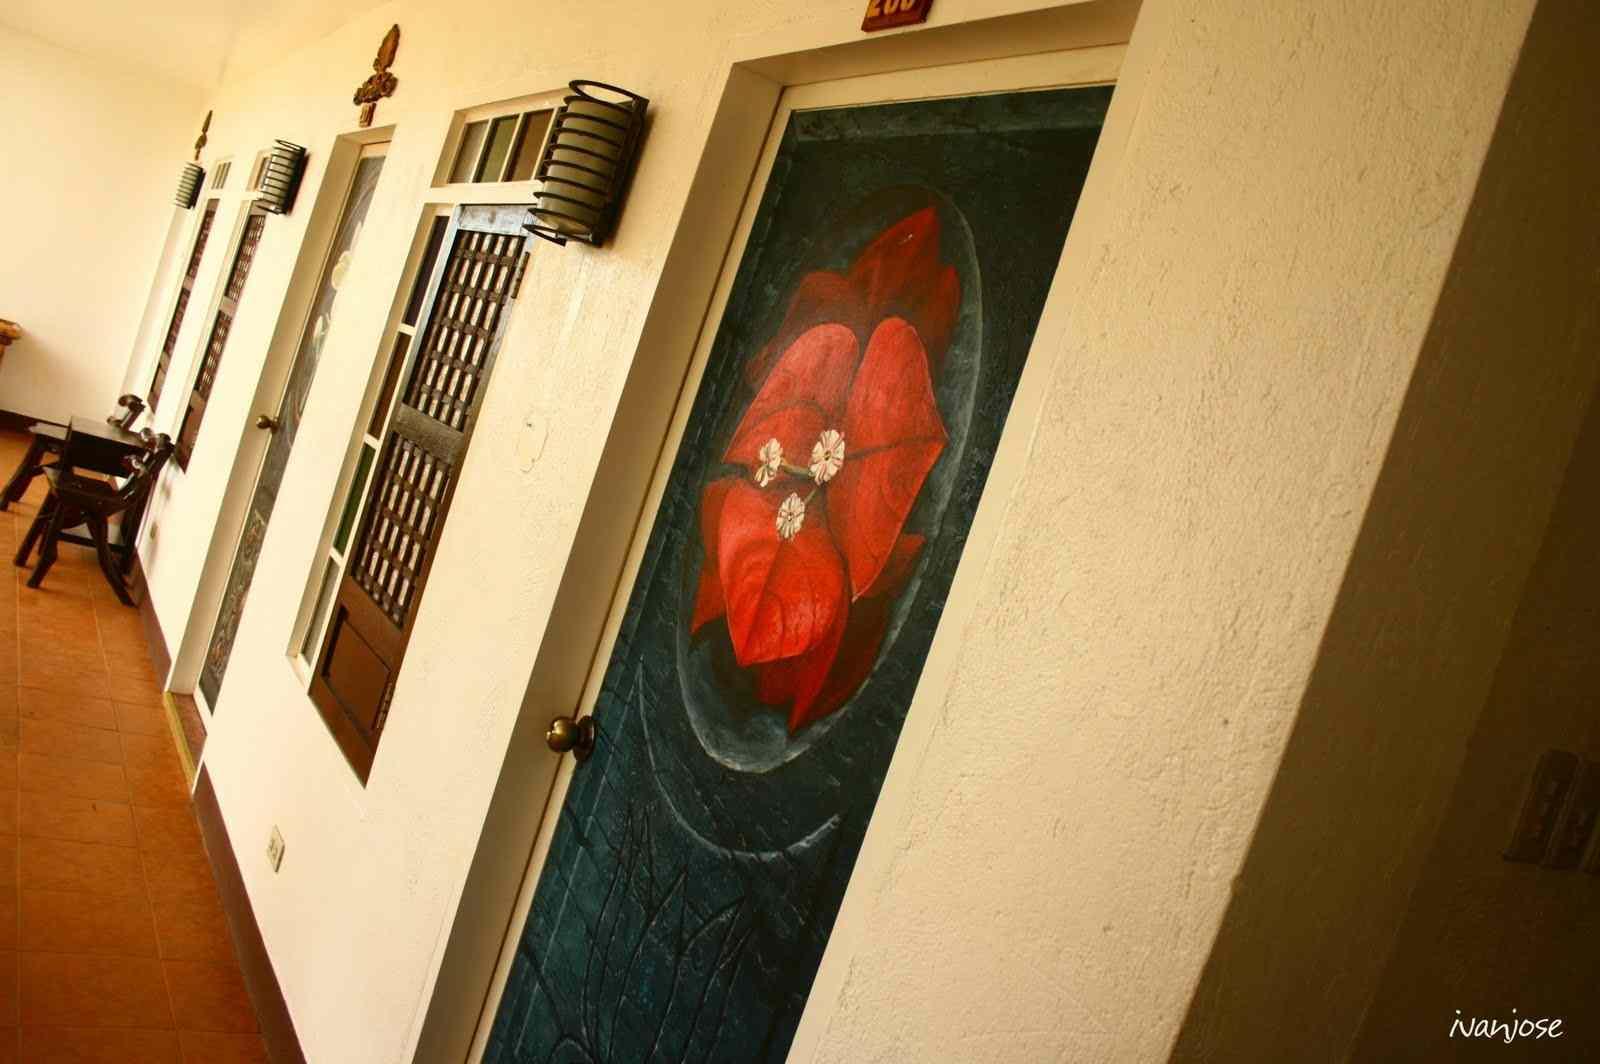 Hand-painted doors in Sarangani Highlands in Mindanao